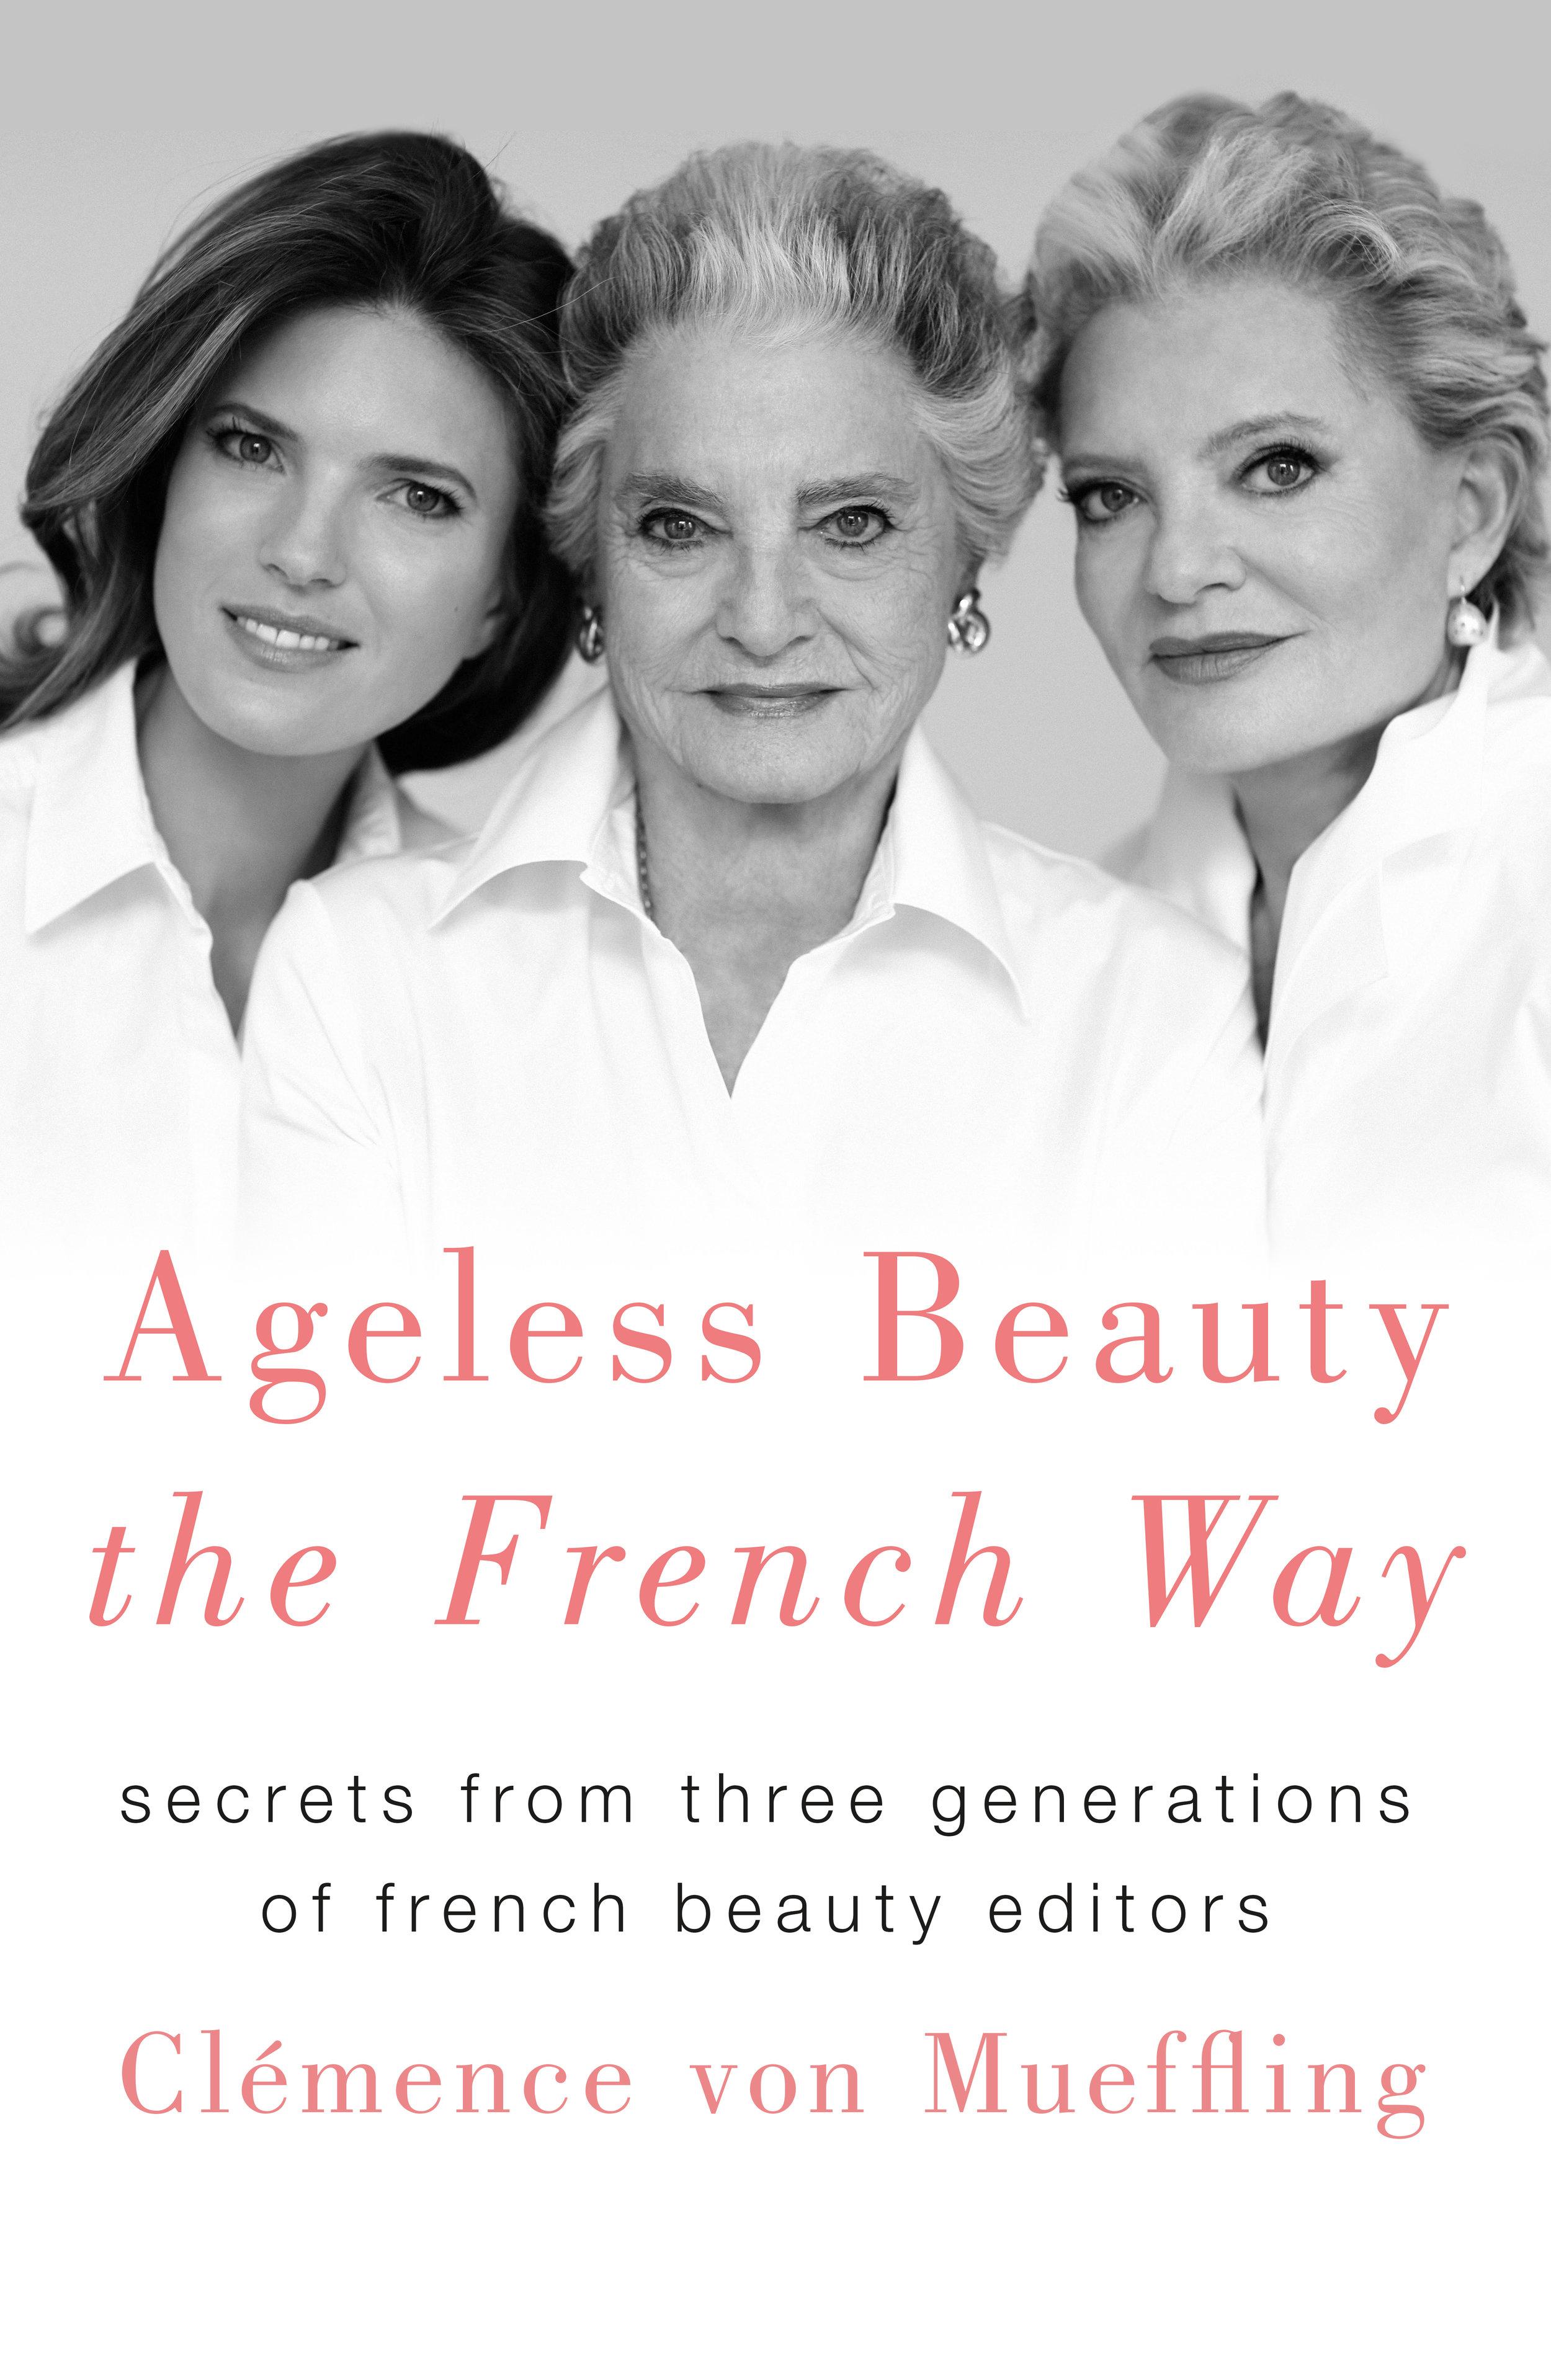 Clemence-von-Mueffling-ageless-beauty-french-way